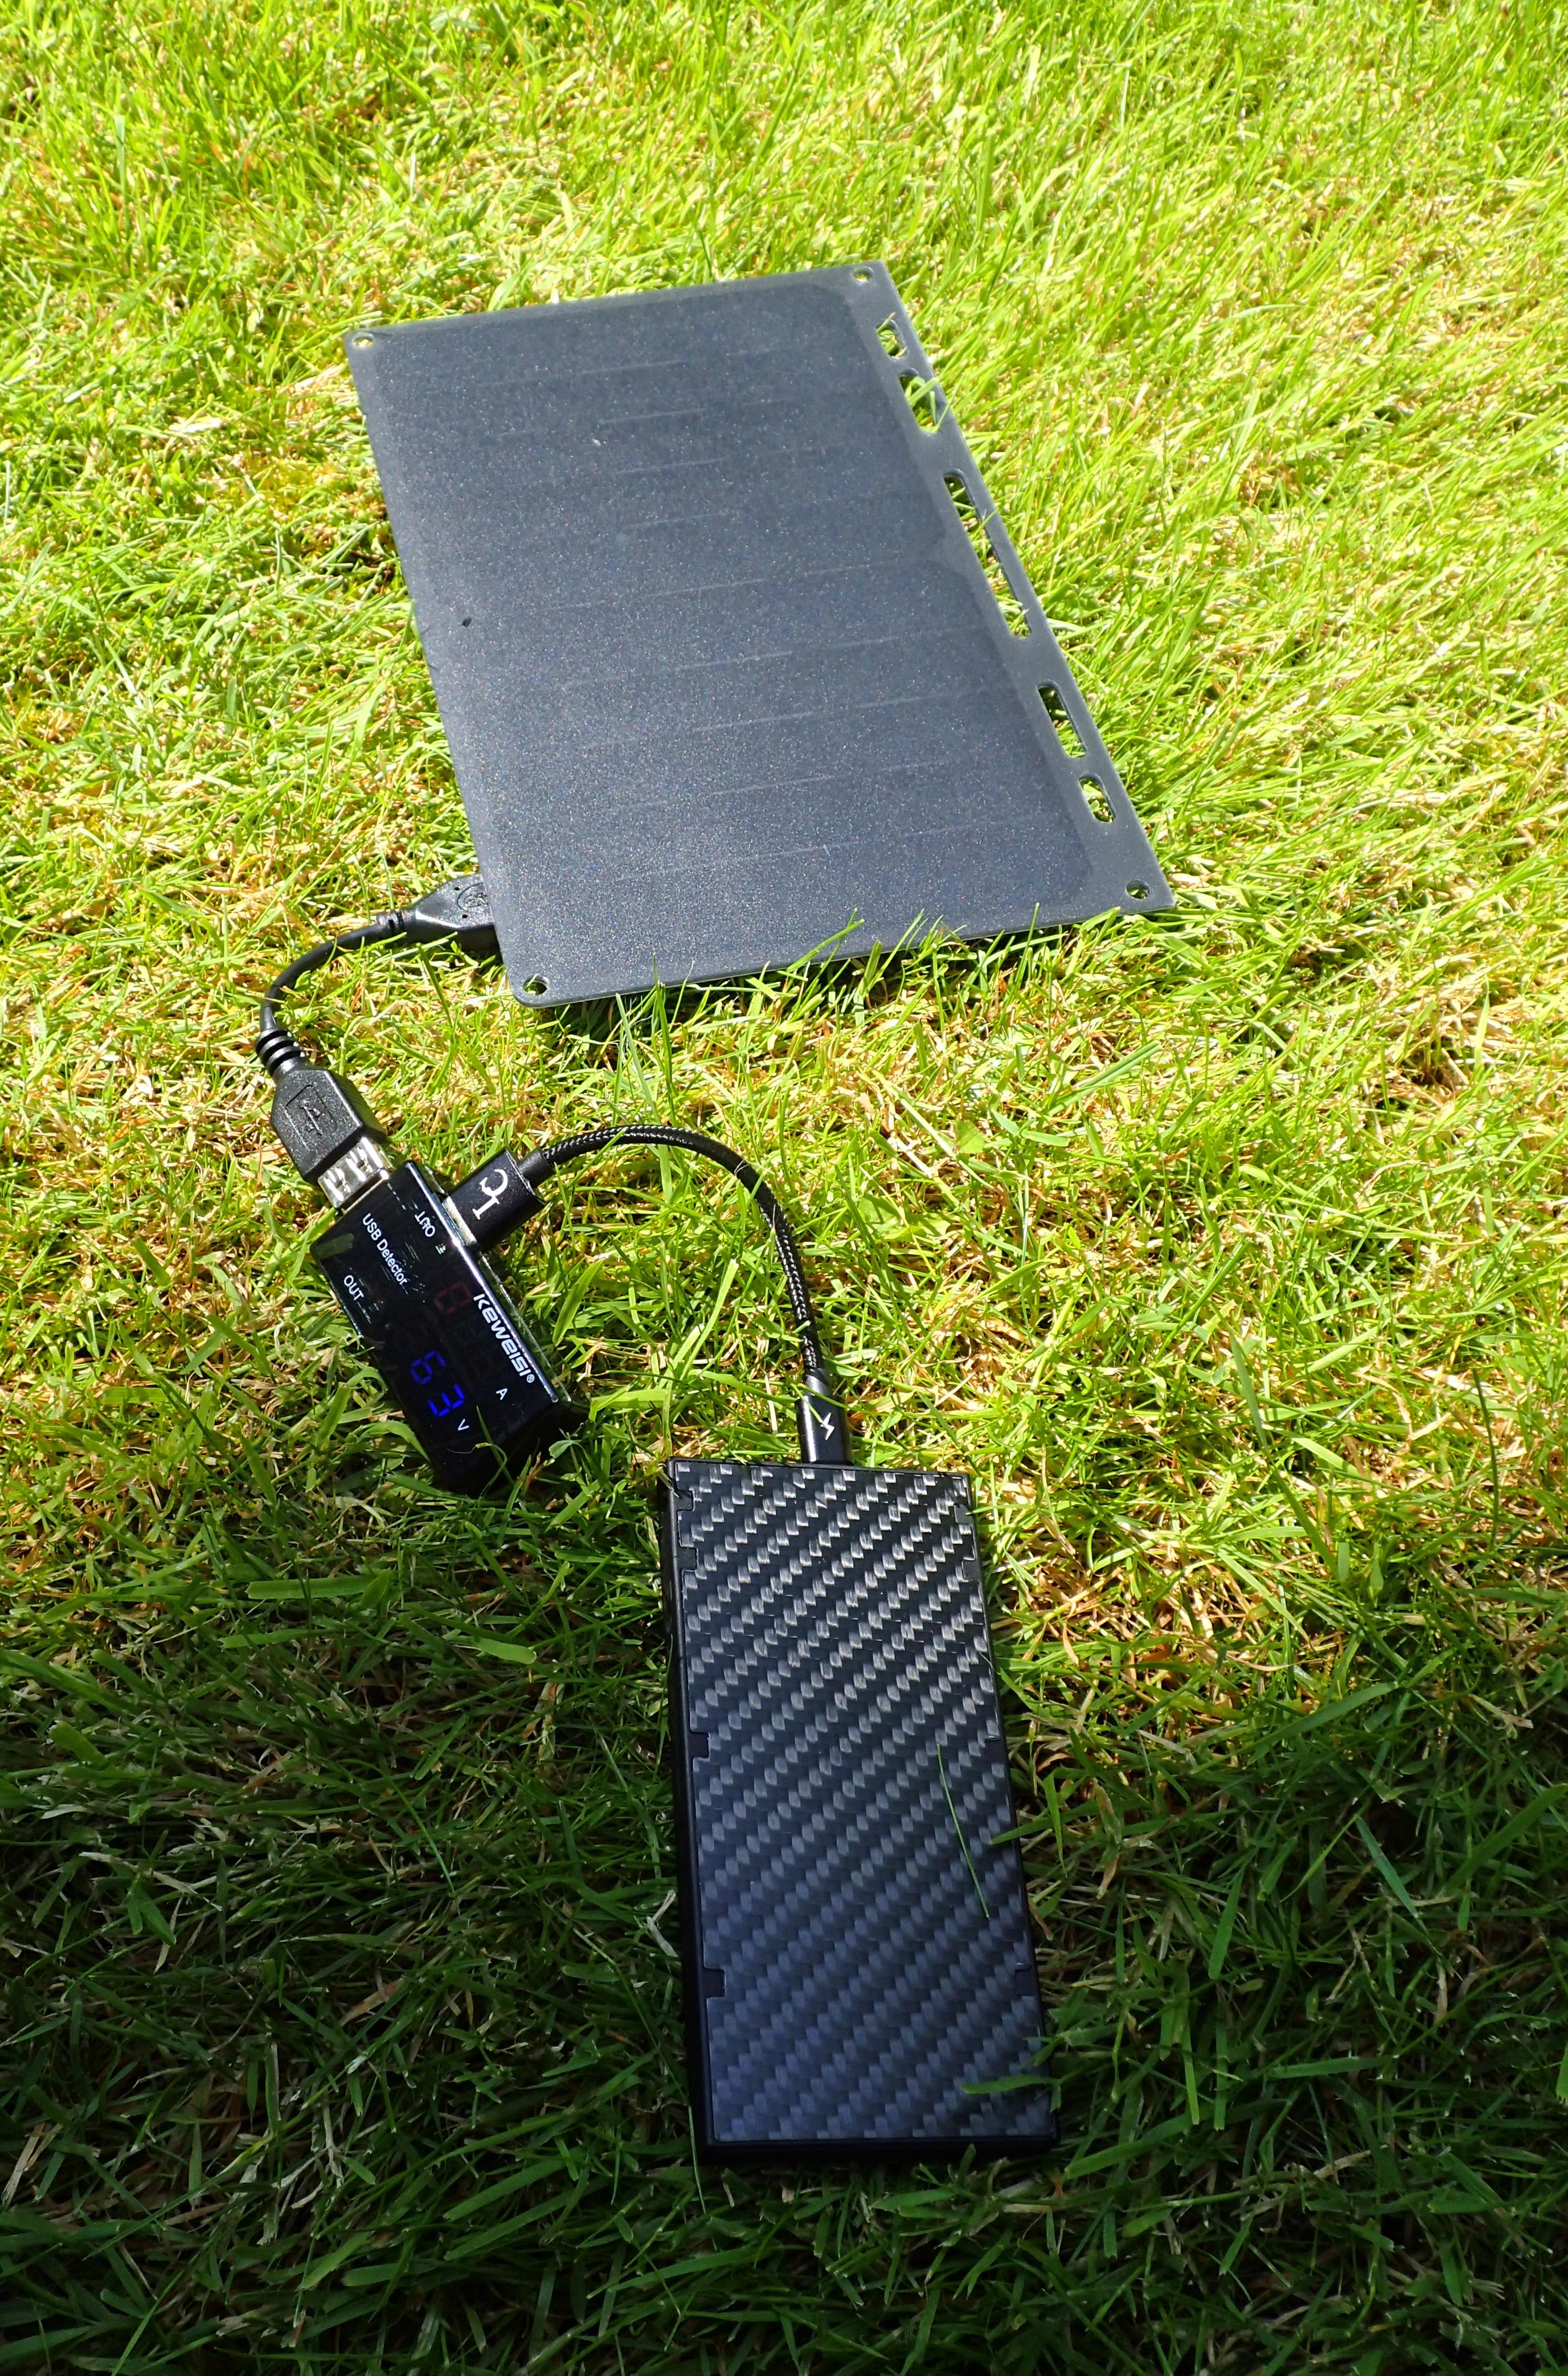 Lixada '10w' solar panel charging Nitecore NB10000 powerbank